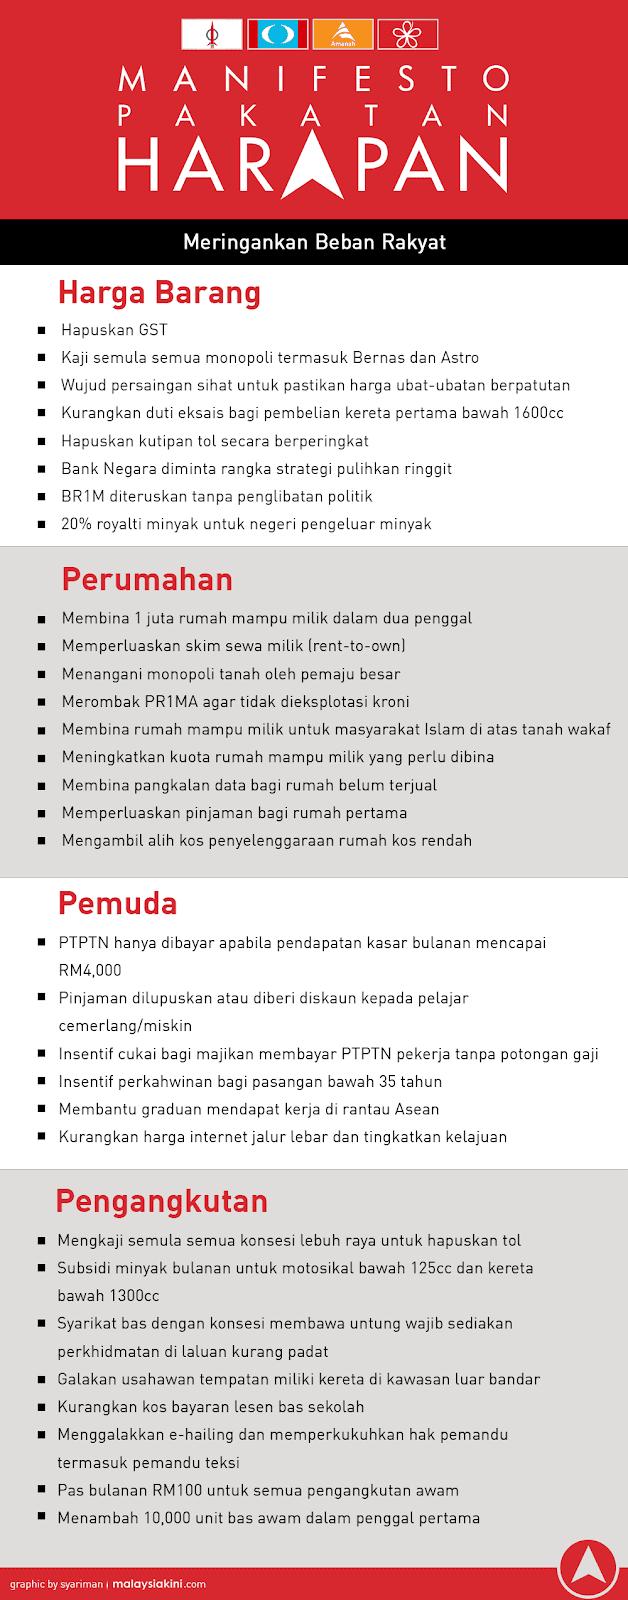 Keputusan Parlimen Malaysia 2018 & Manifesto Pakatan Harapan (PH)